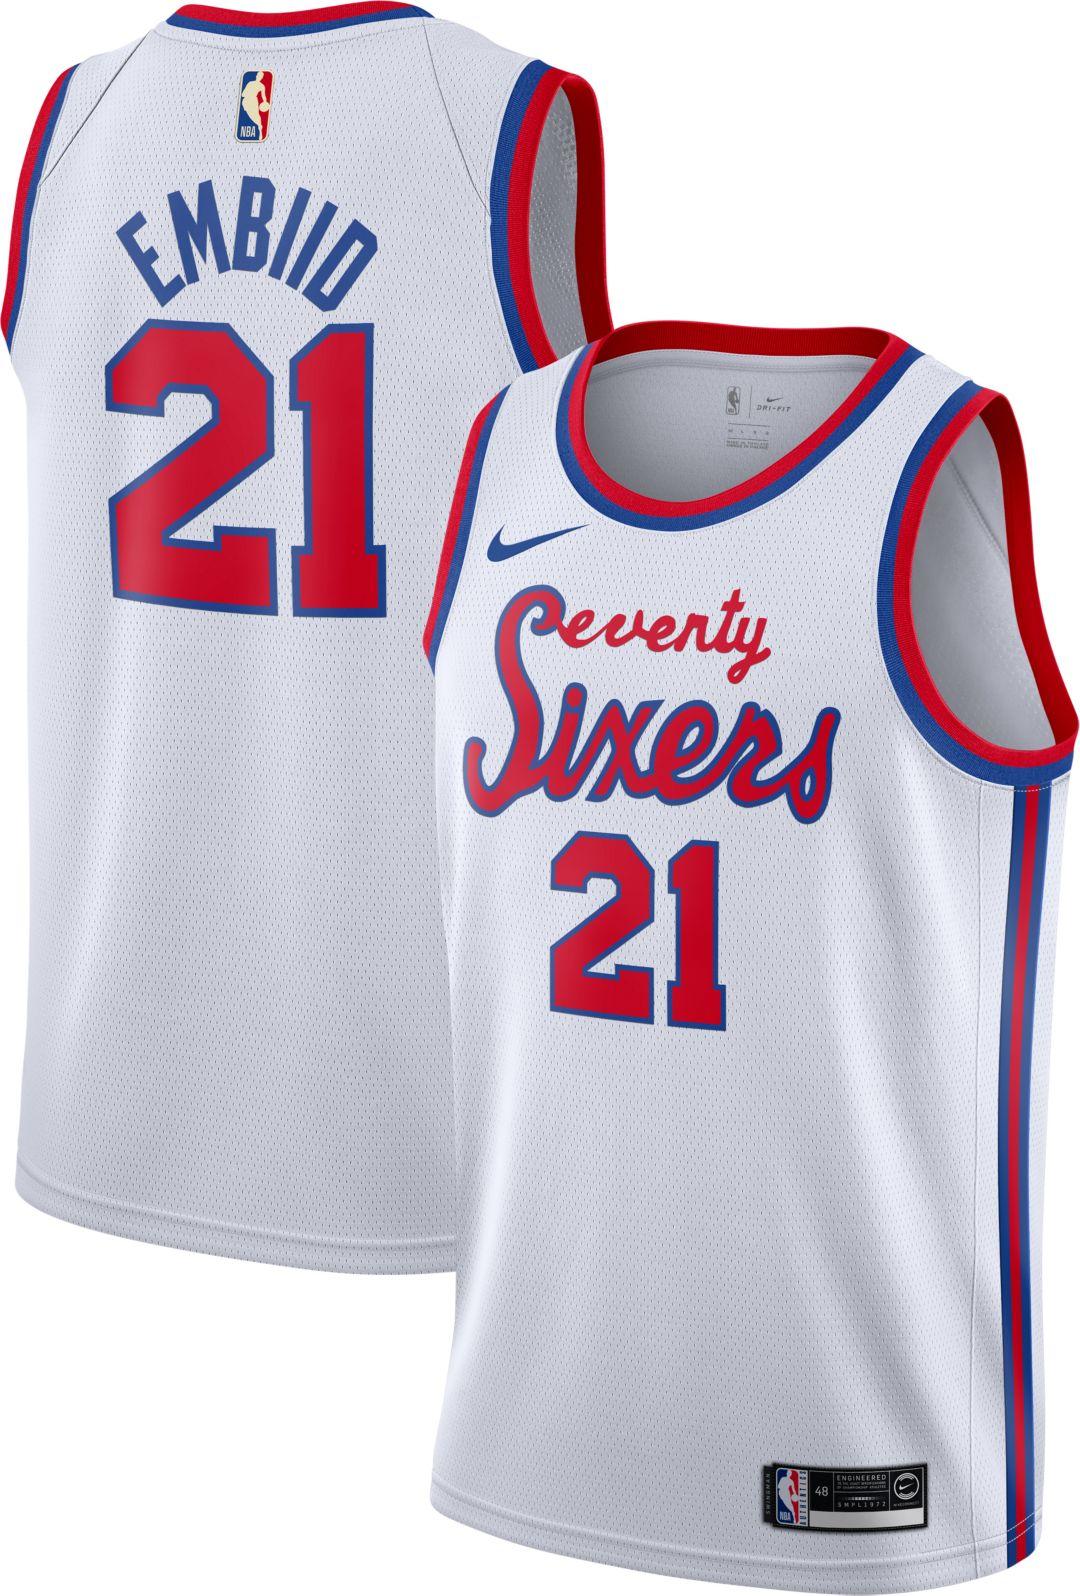 pretty nice 8aa2f f1f55 Nike Men's Philadelphia 76ers Joel Embiid #21 Hardwood Classic Dri-FIT  Swingman Jersey